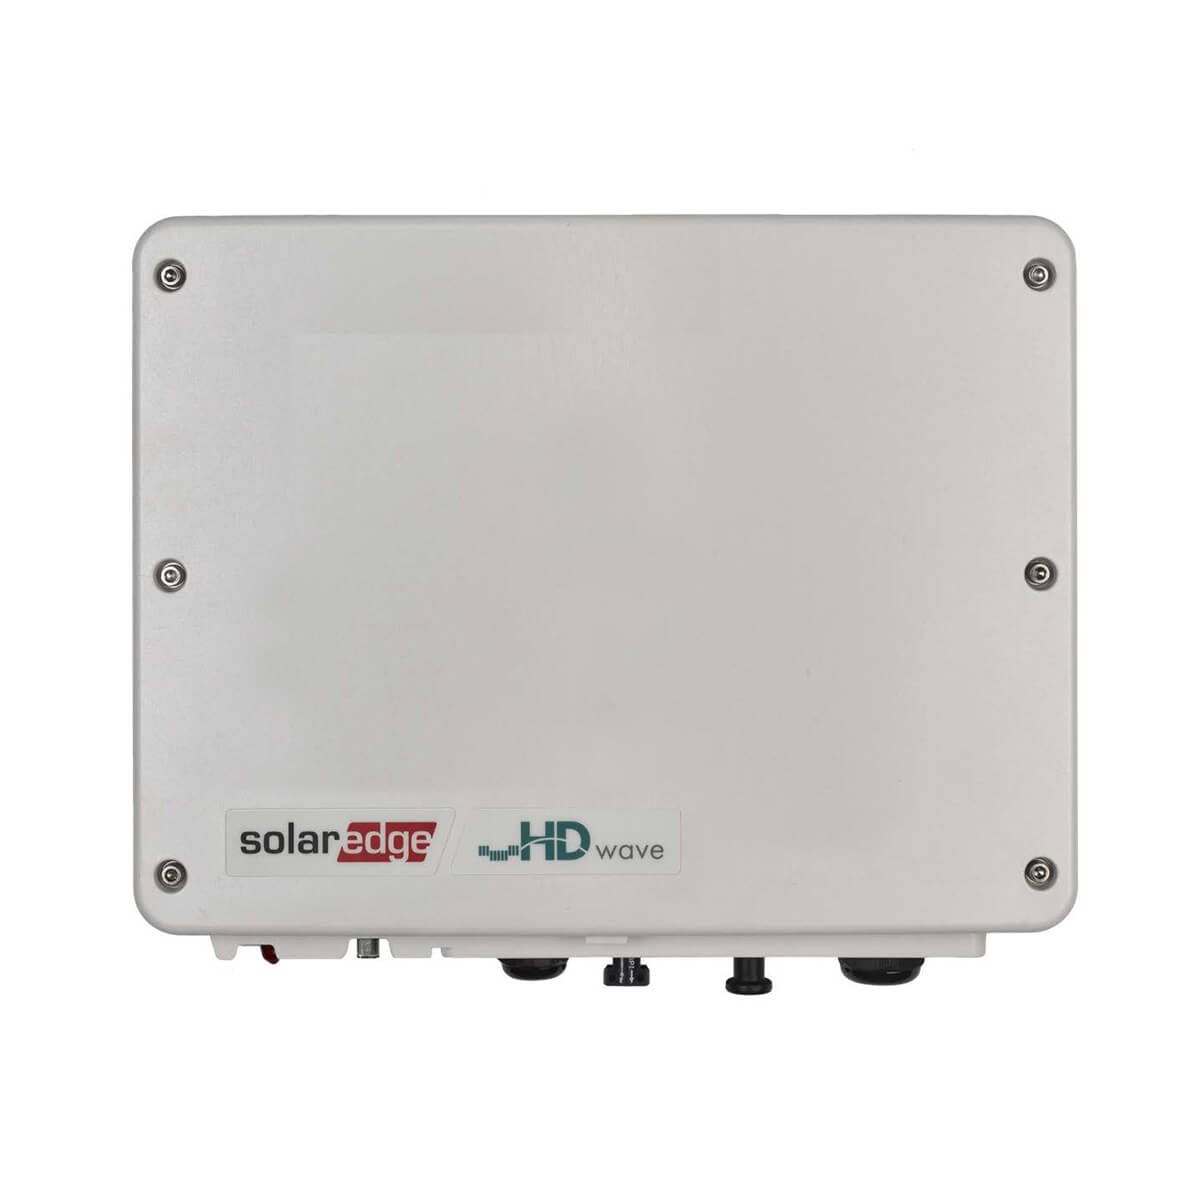 solaredge 6kW inverter, solaredge se6000h 6kW inverter, solaredge se6000h inverter, solaredge se6000h, solaredge 6 kW